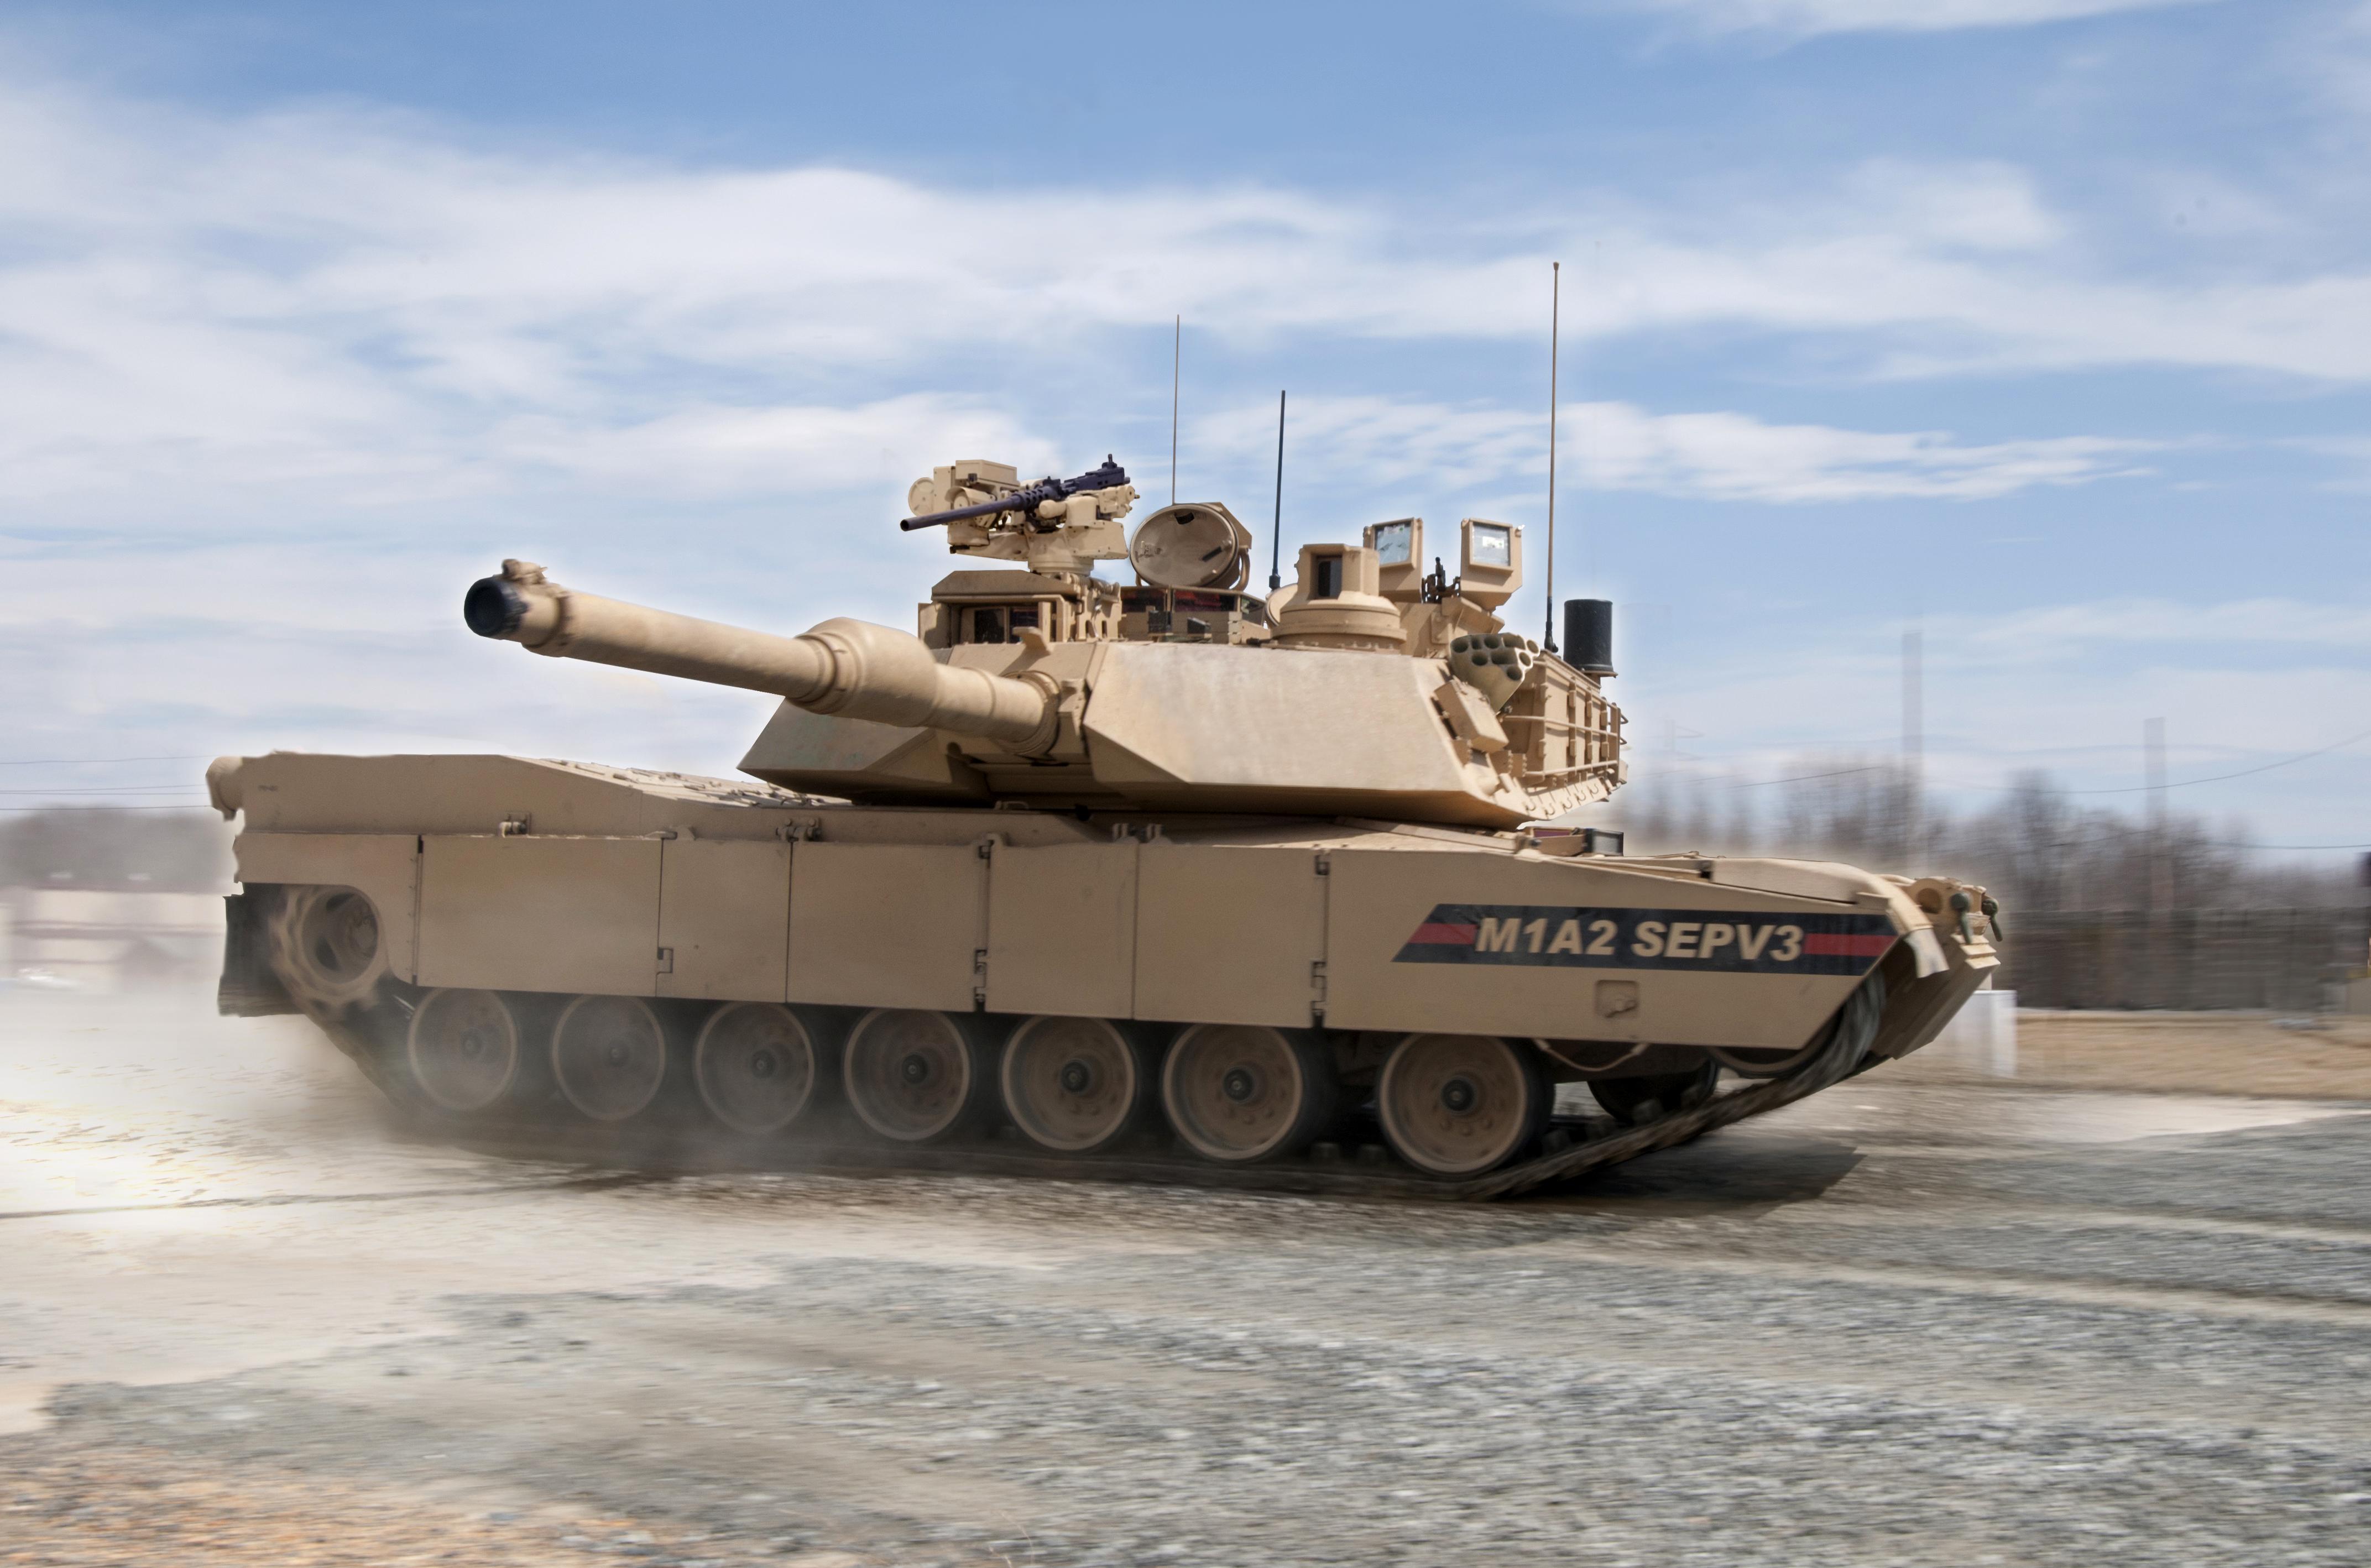 General Dynamics Land Systems M1A2 Abrams SEPv3